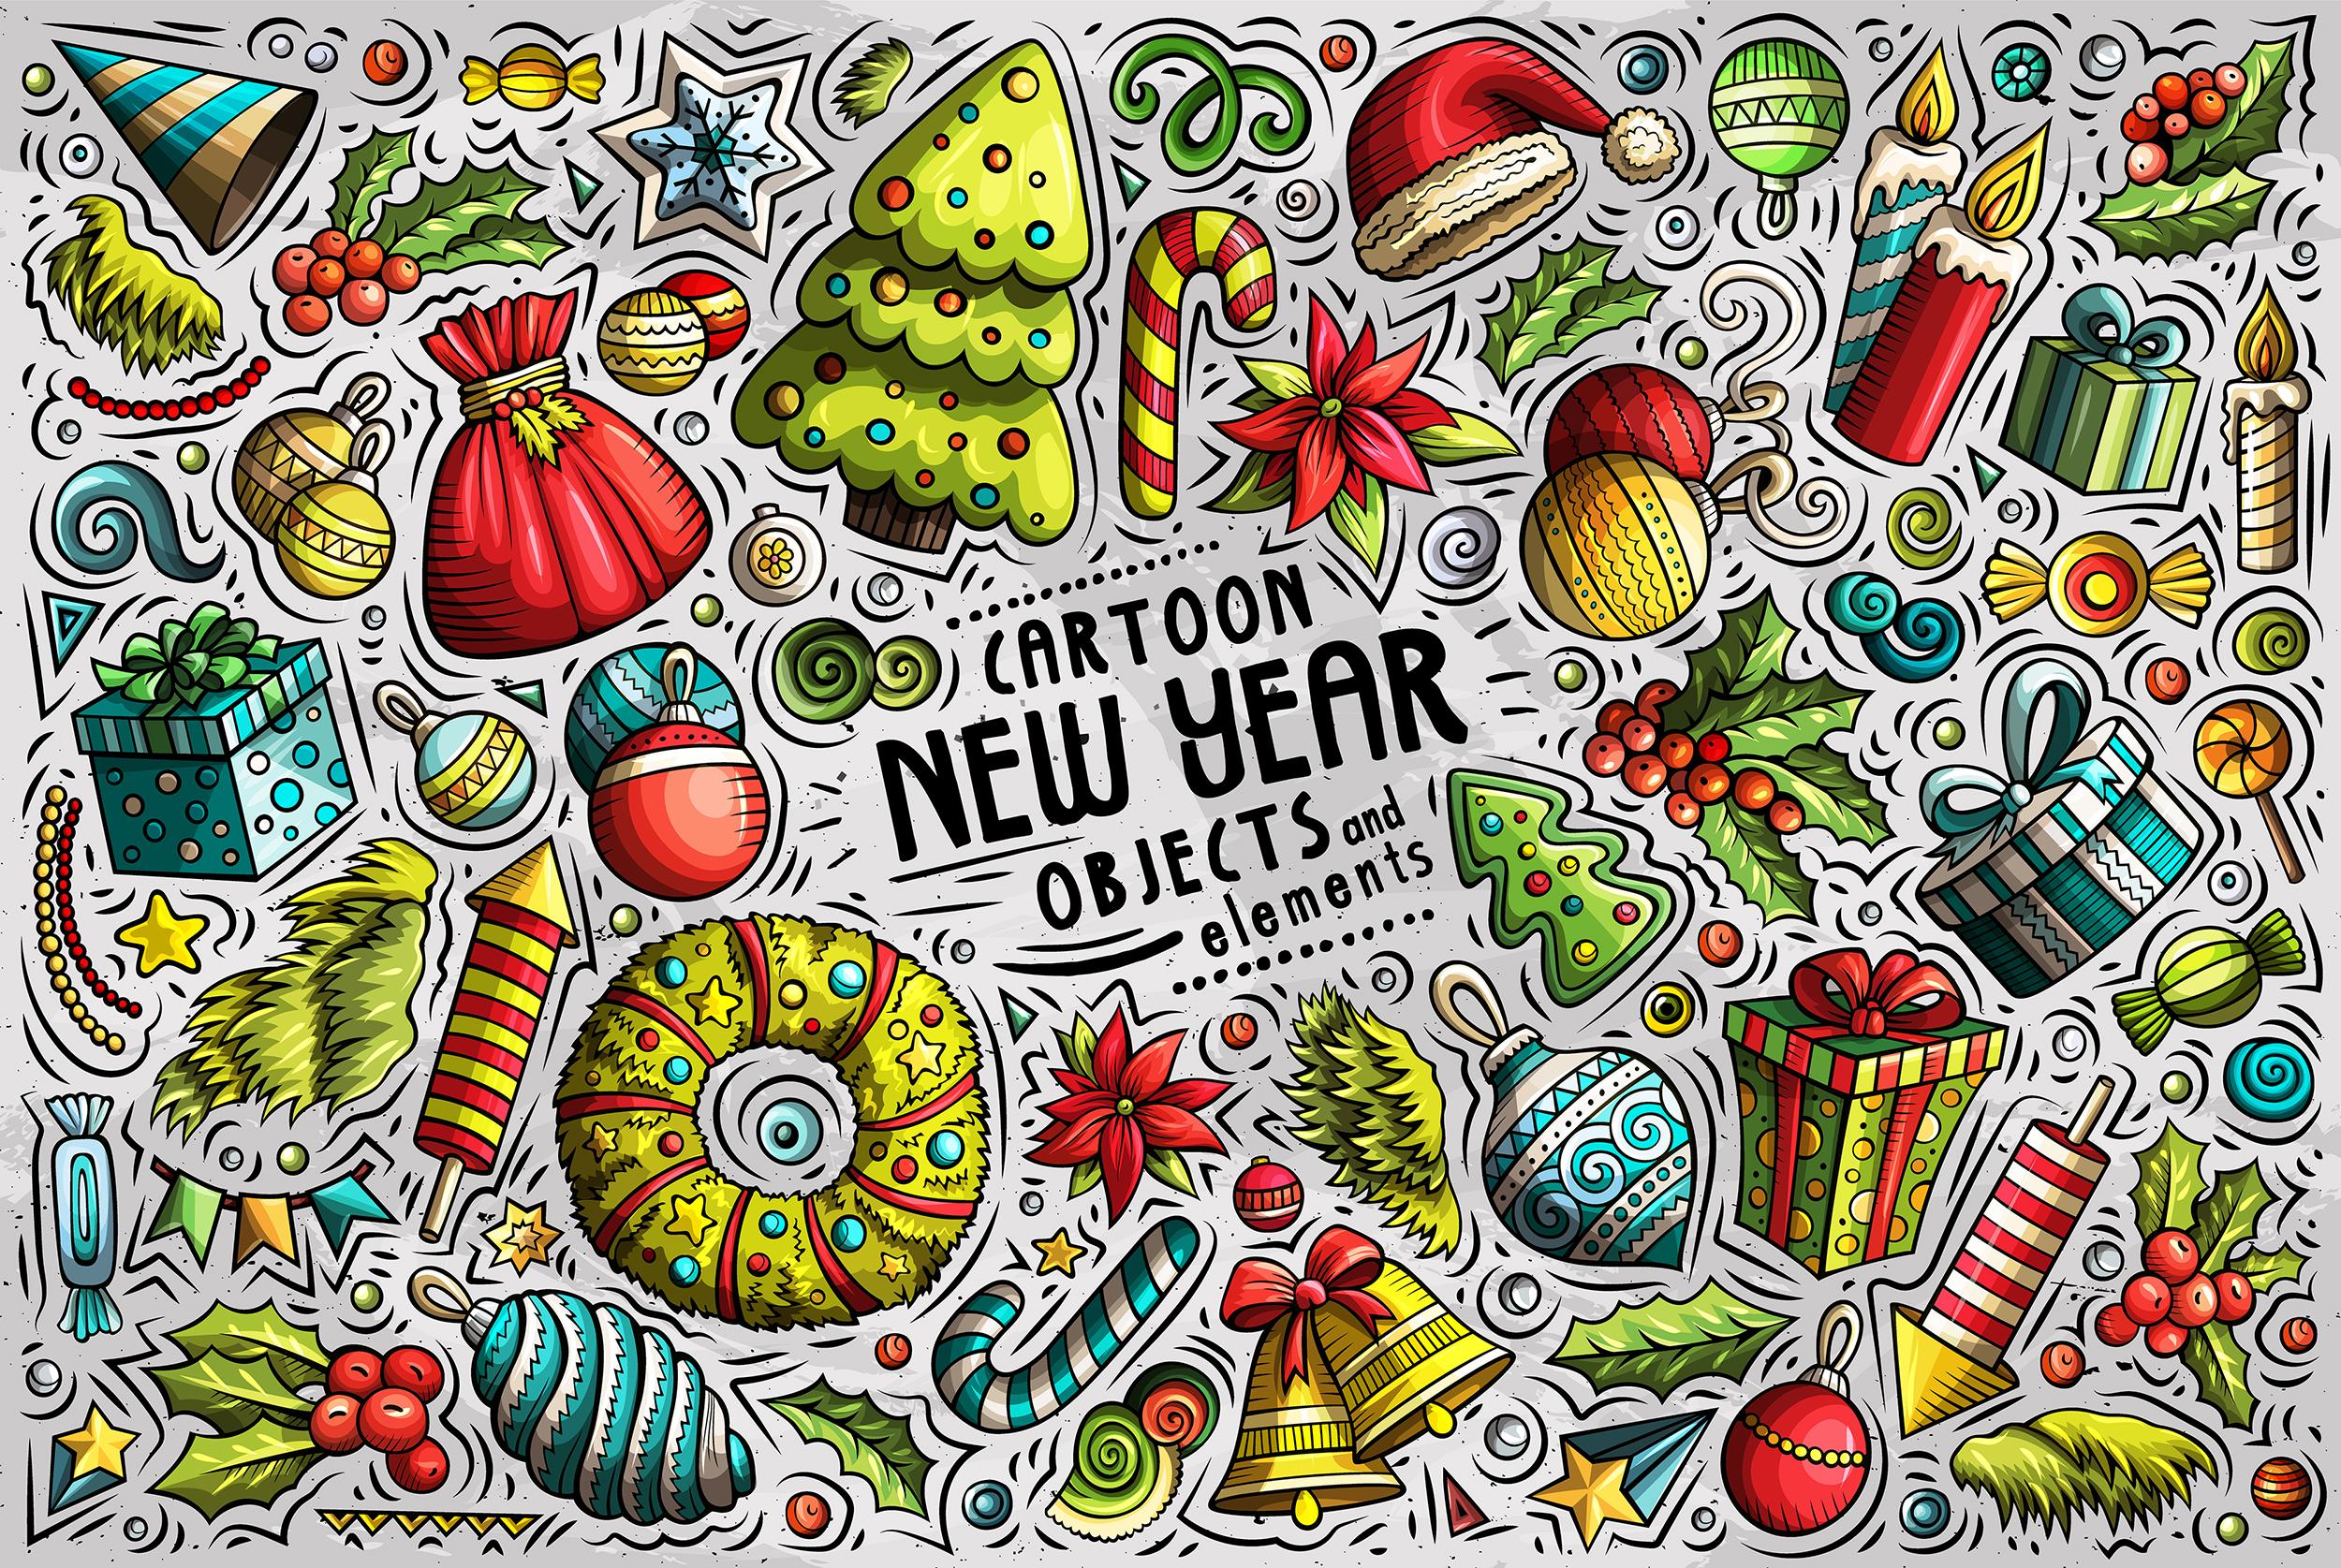 New Year Cartoon Objects Set example image 1